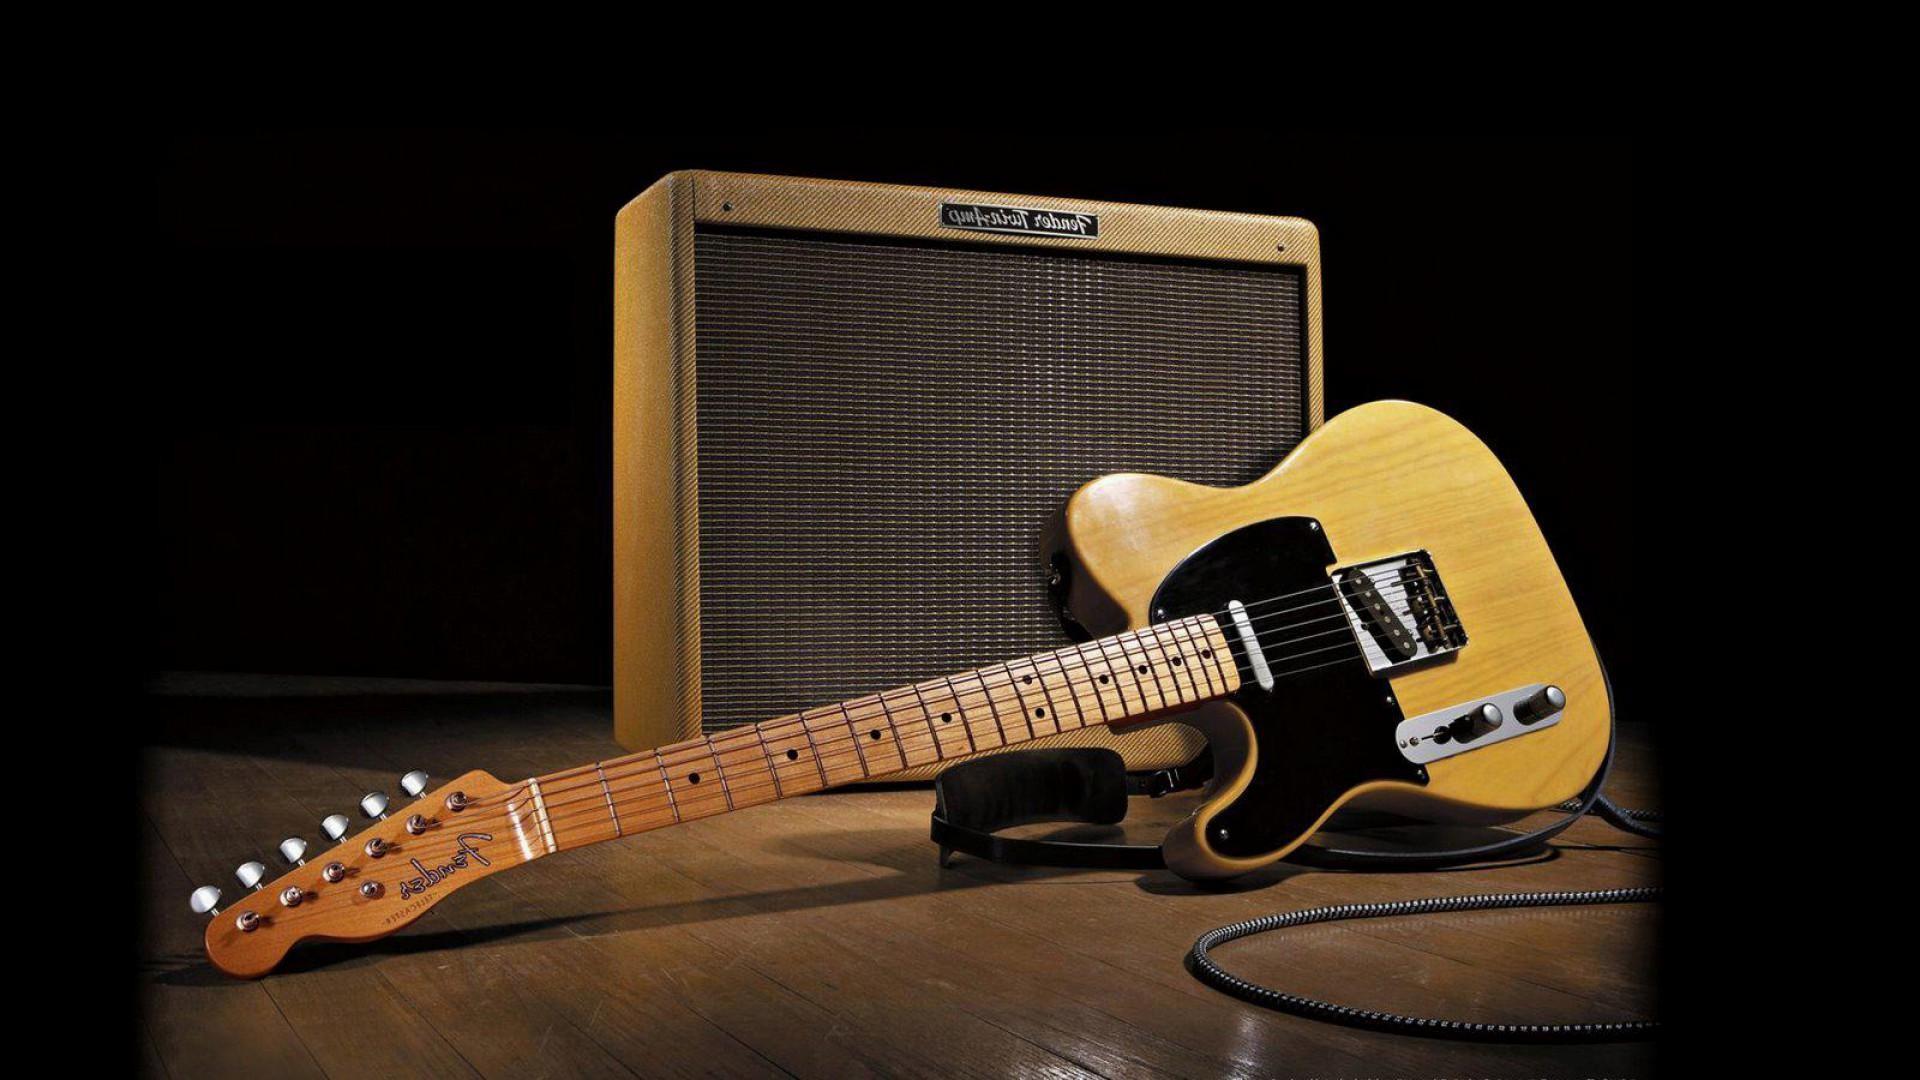 Awesome-Examples-of-Guitar-for-Free-Naldz-Graphics-